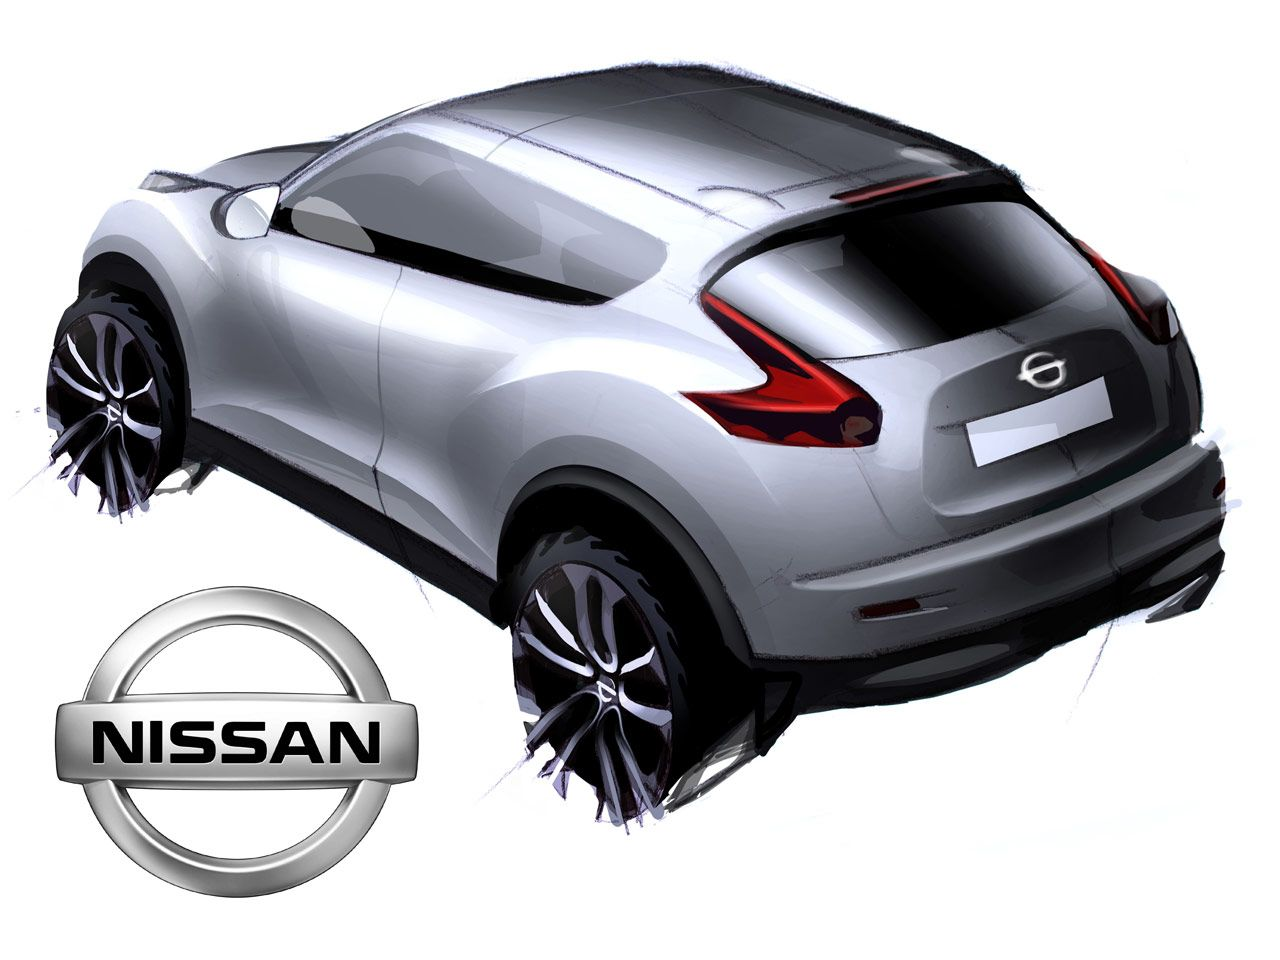 Nissan-Juke-Design